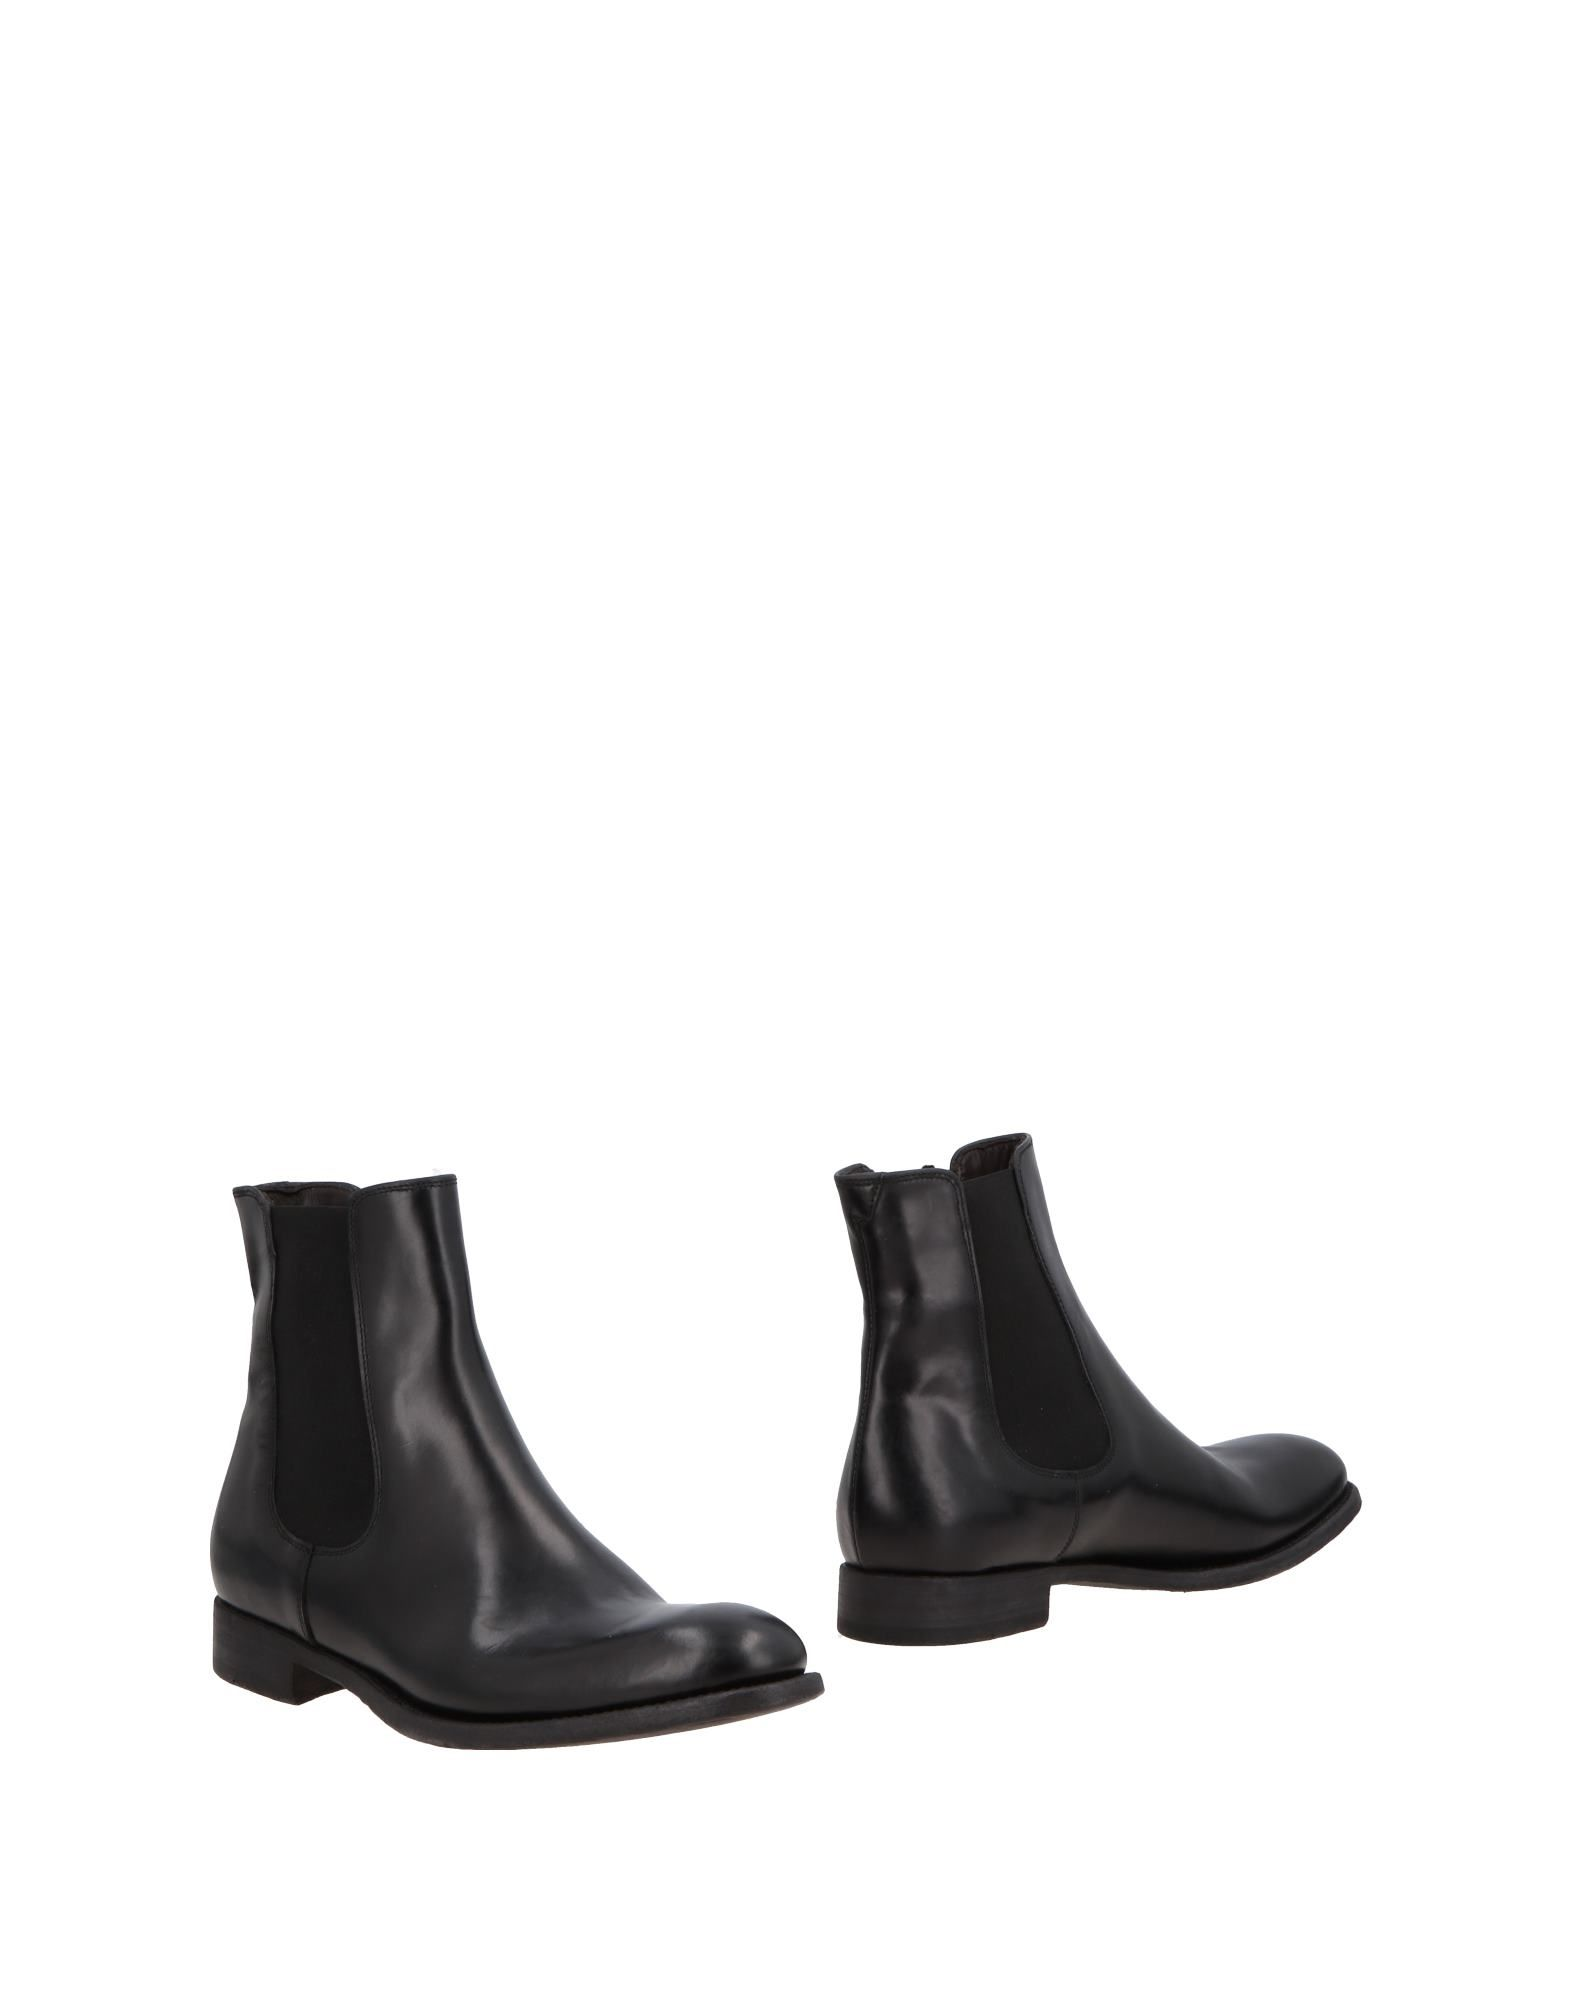 Pantofola D'oro Chelsea Boots Damen  11498875FCGut aussehende strapazierfähige Schuhe